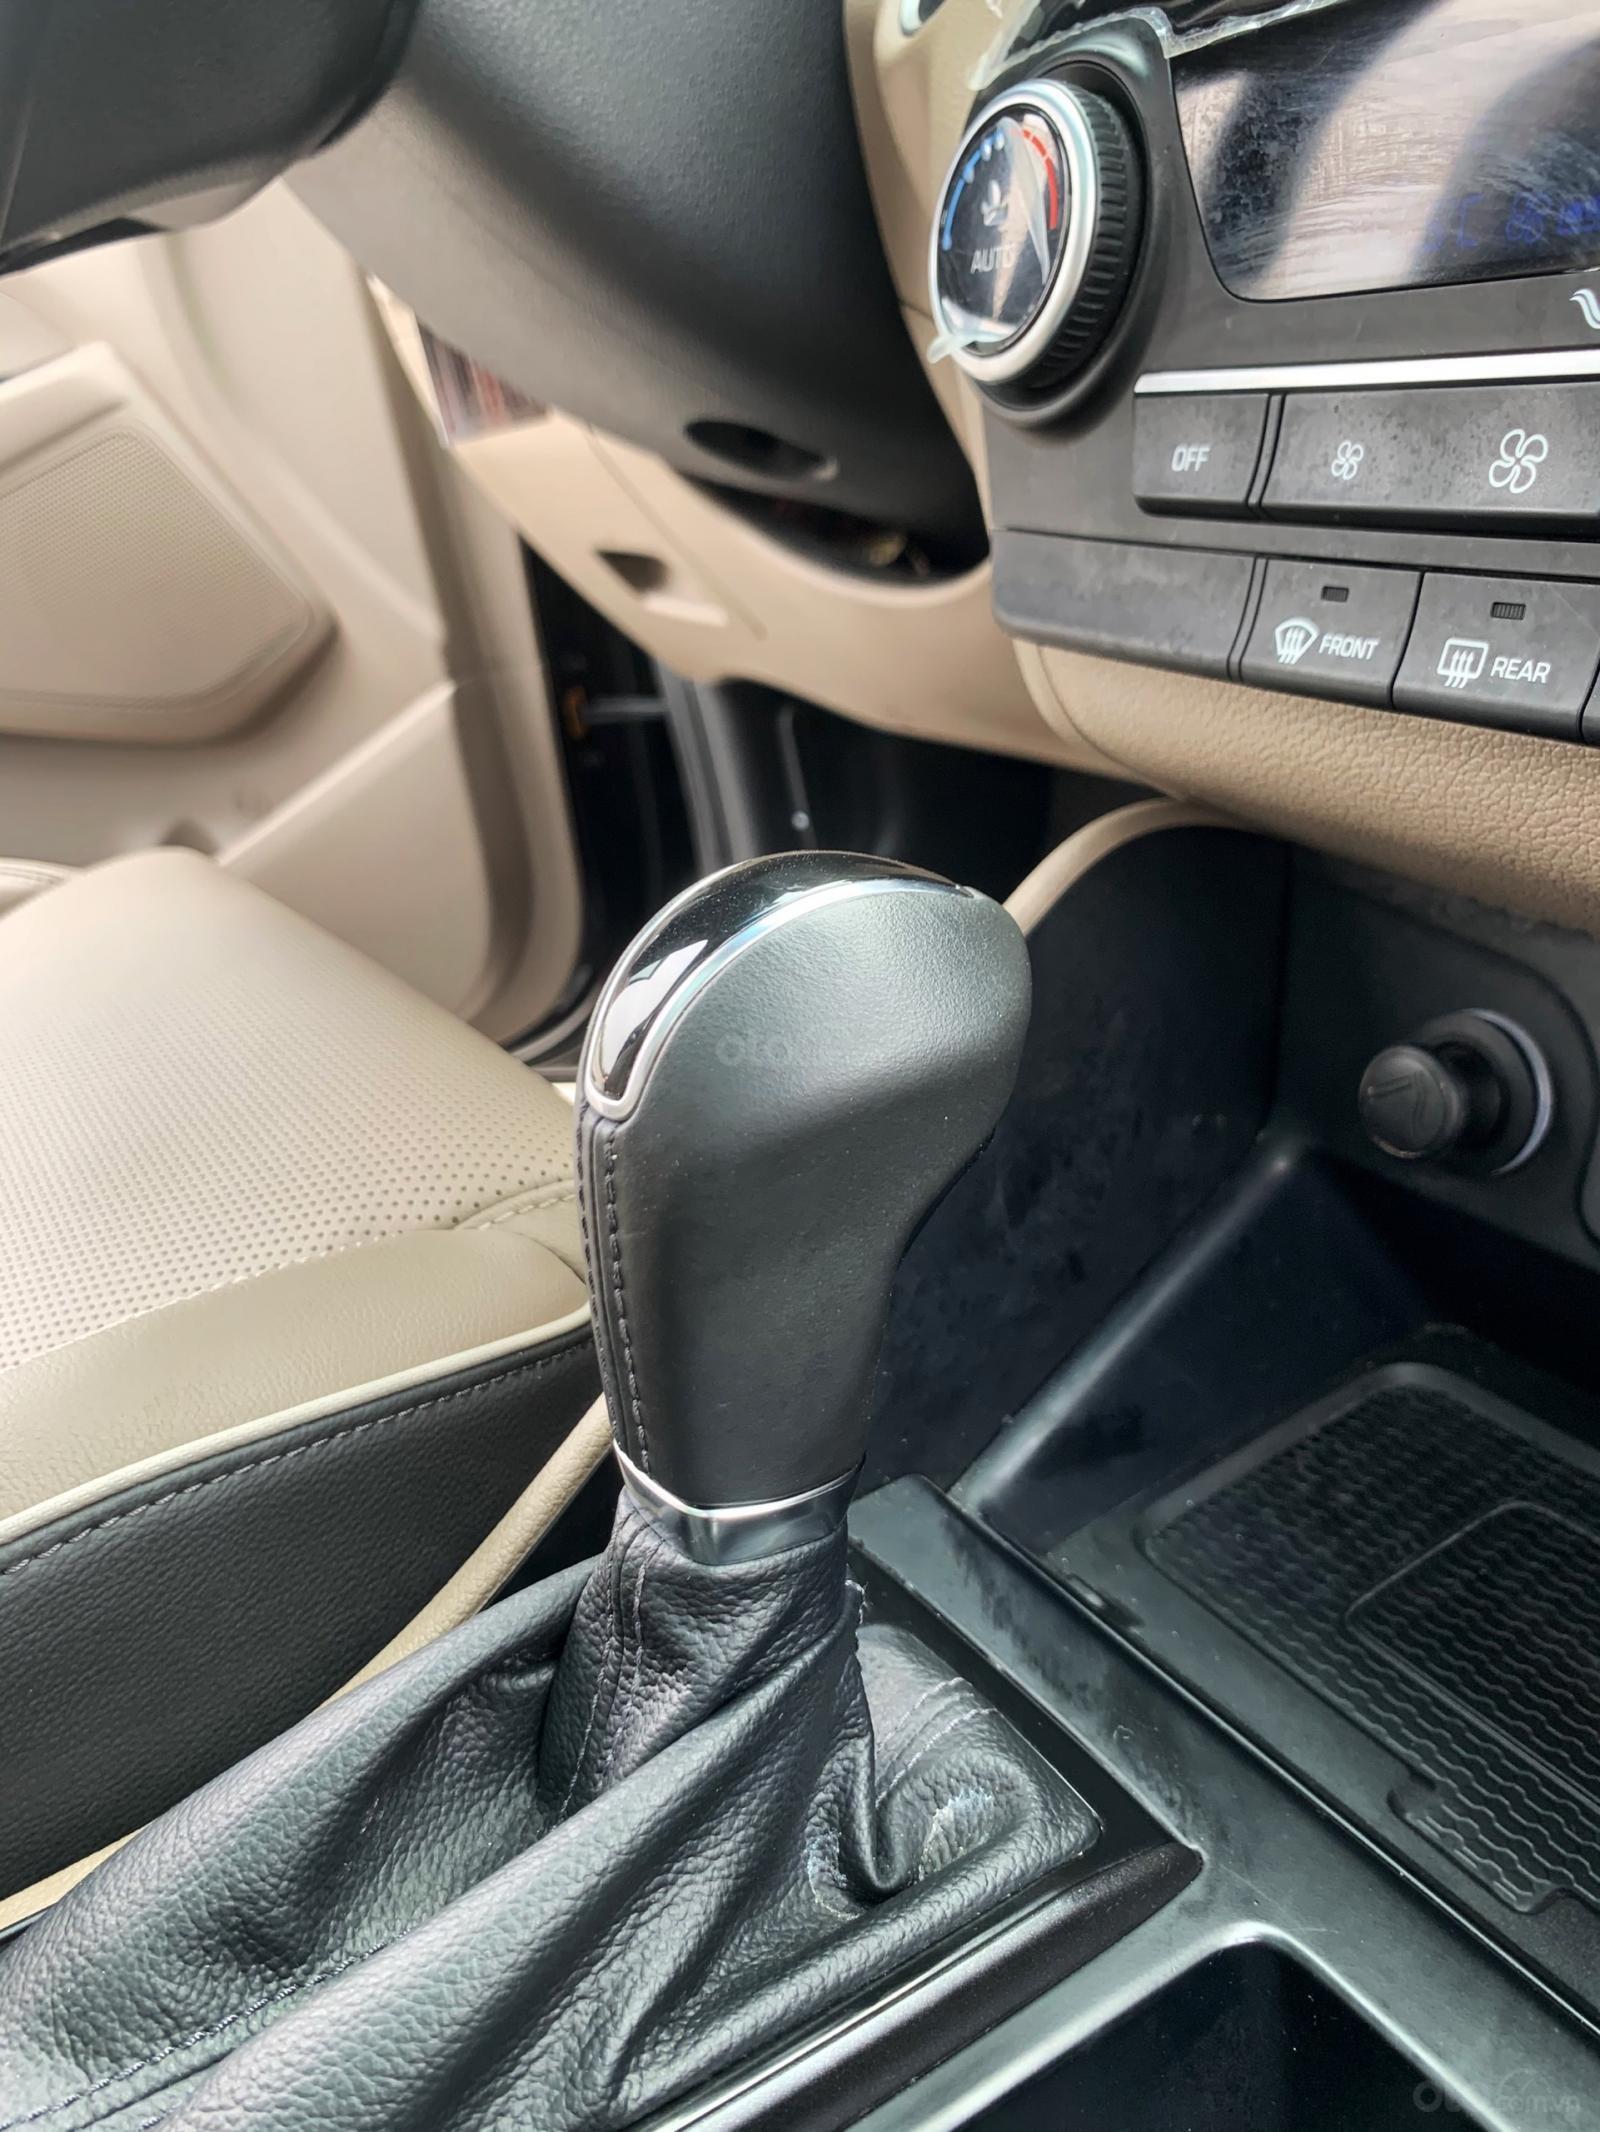 Cần bán gấp Hyundai Tucson 1.6 Turbo sx năm 2019, 878 triệu (12)